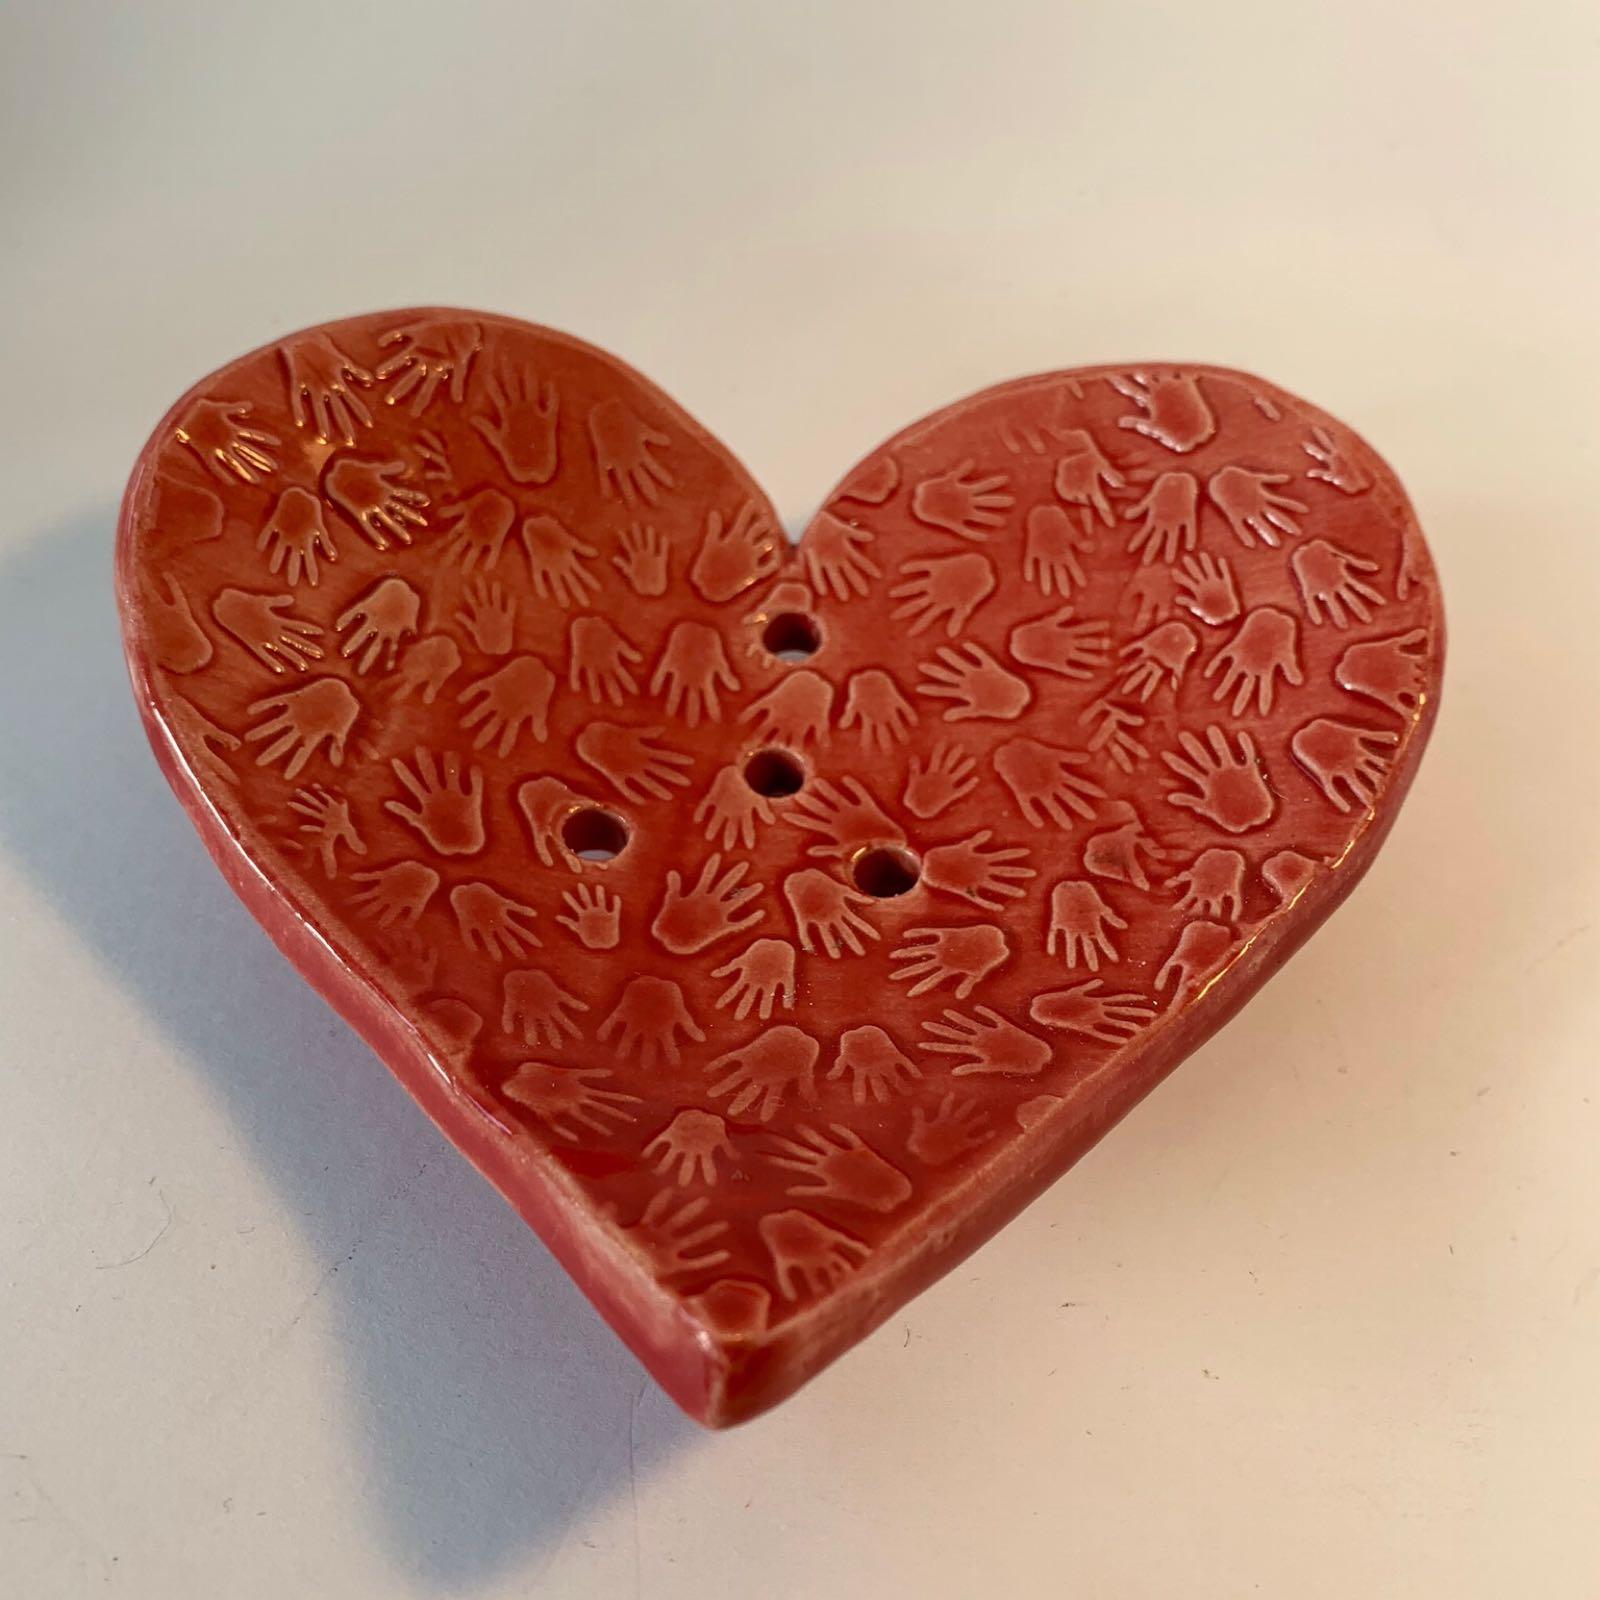 Ceramic Heart Soap Dish - Red